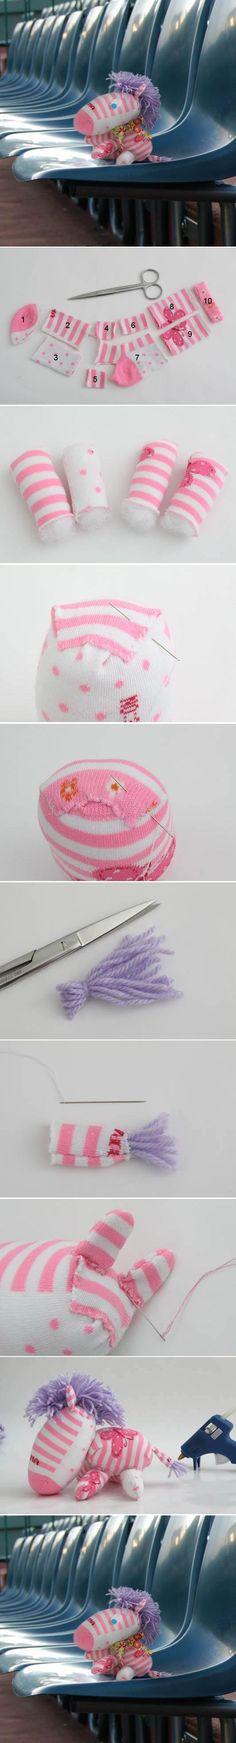 DIY Little Sock Zebra DIY Little Sock Zebra